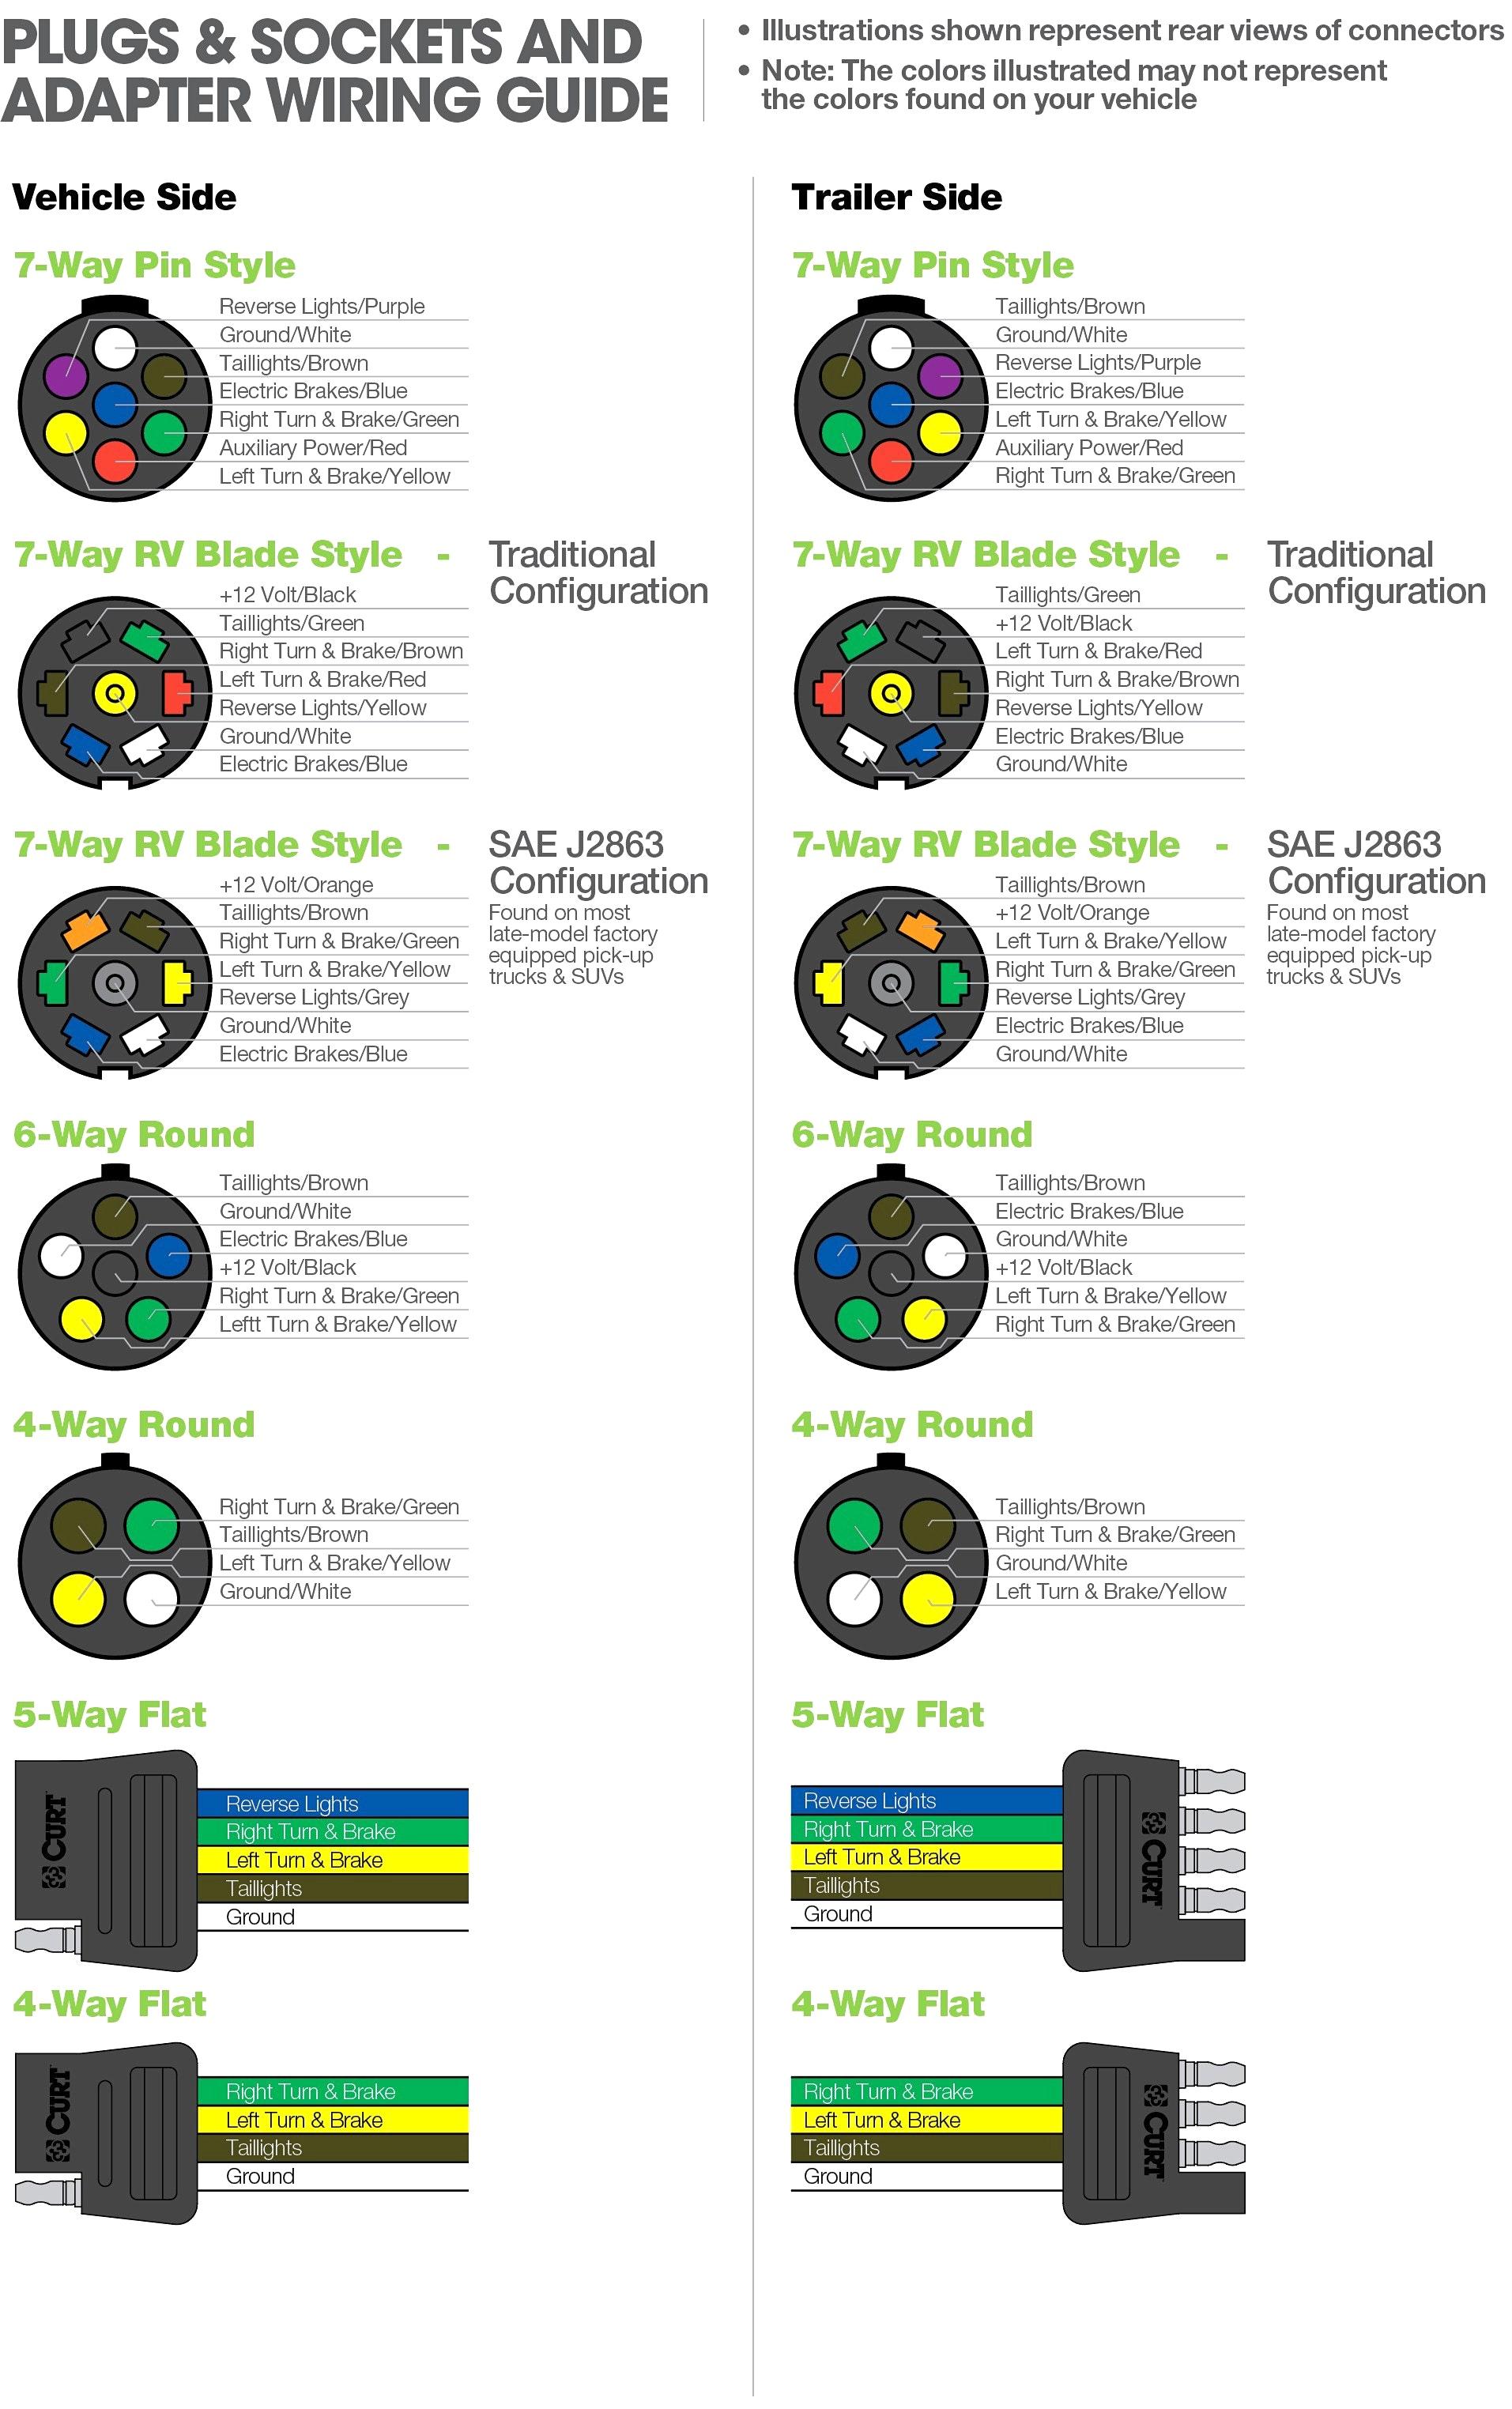 Boat Trailer Wiring Diagram 4 Way Residentevil Me 12 7 | Hastalavista - Boat Trailer Wiring Diagram